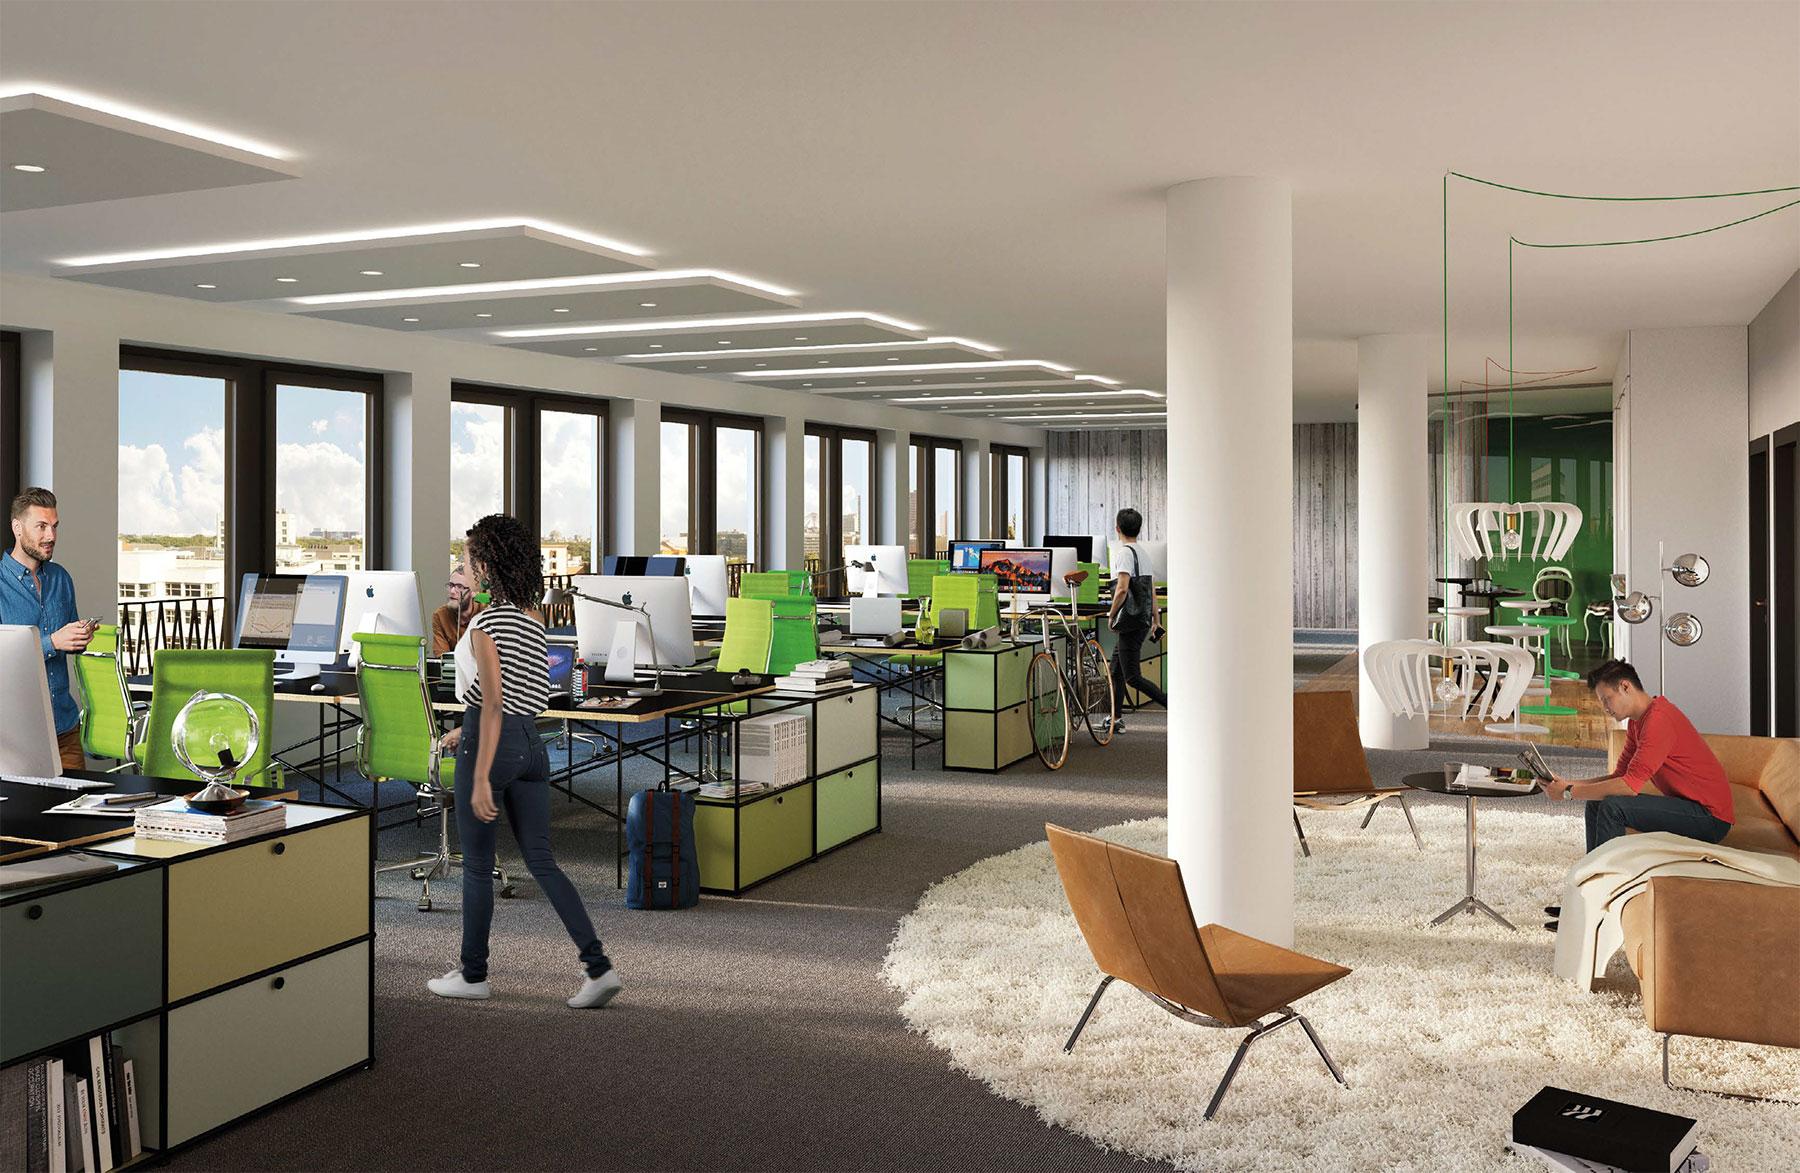 Mesmerizing Möbelhäuser Frankfurt Am Main Und Umgebung Best Choice Of